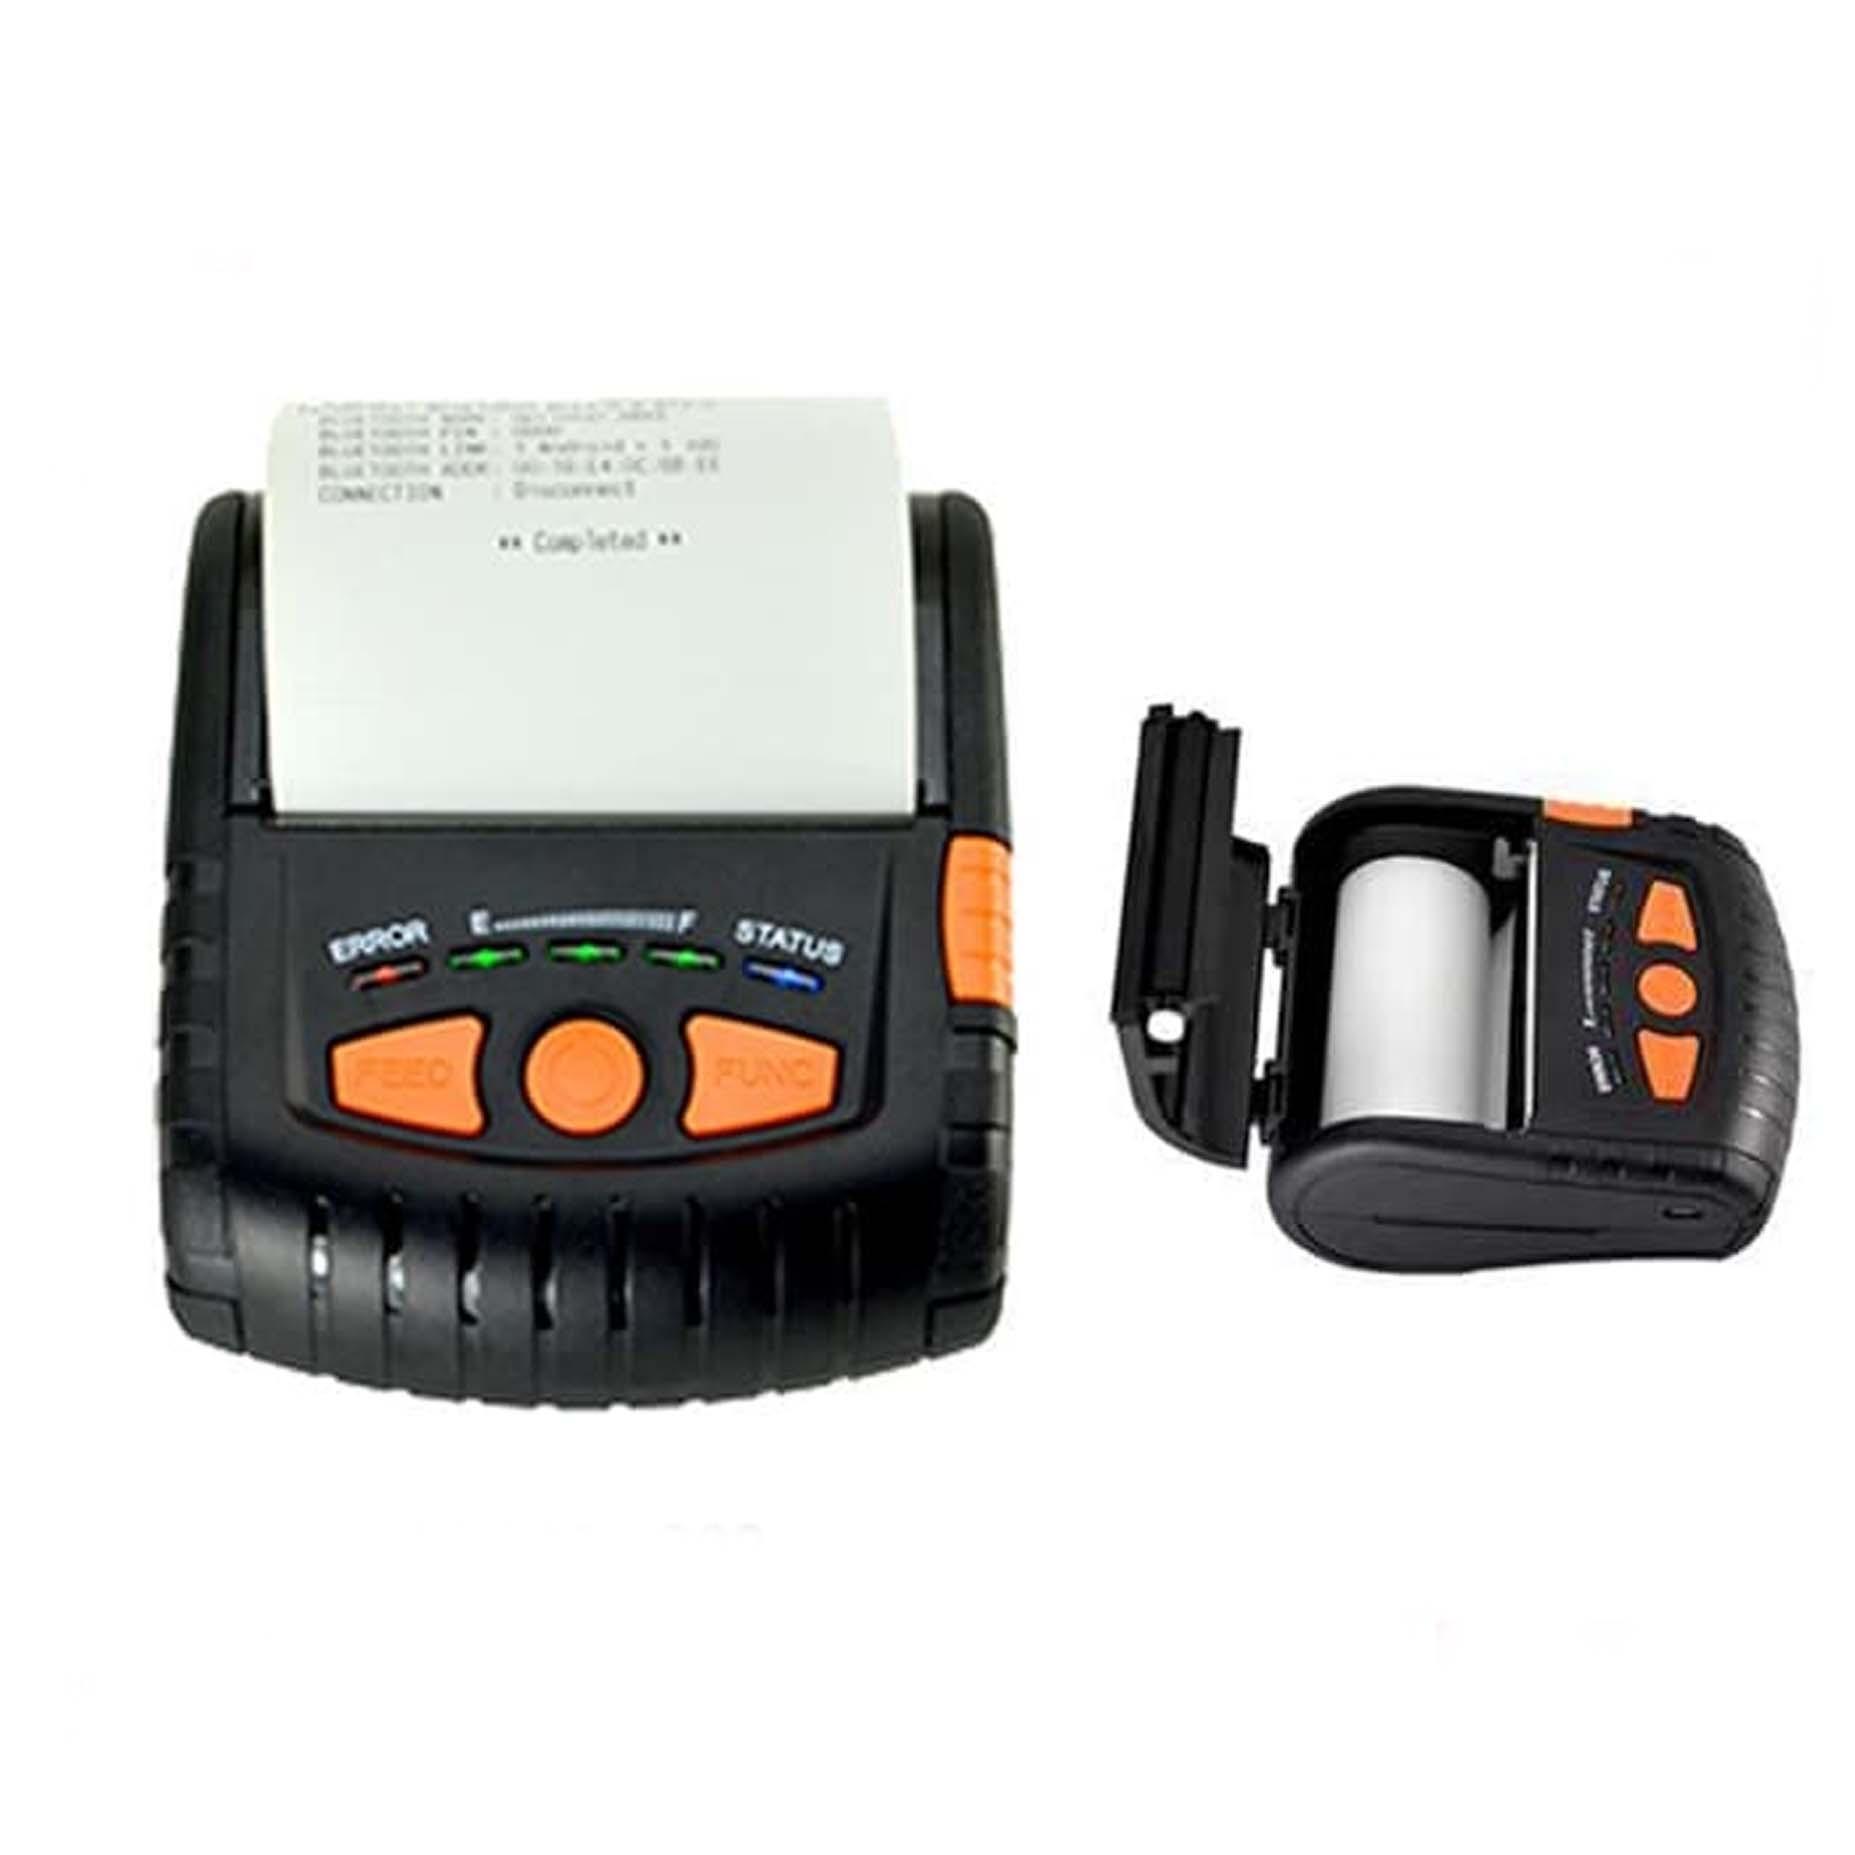 Harga Codesoft Hp-M300e Bluetooth Mobile Thermal Printer